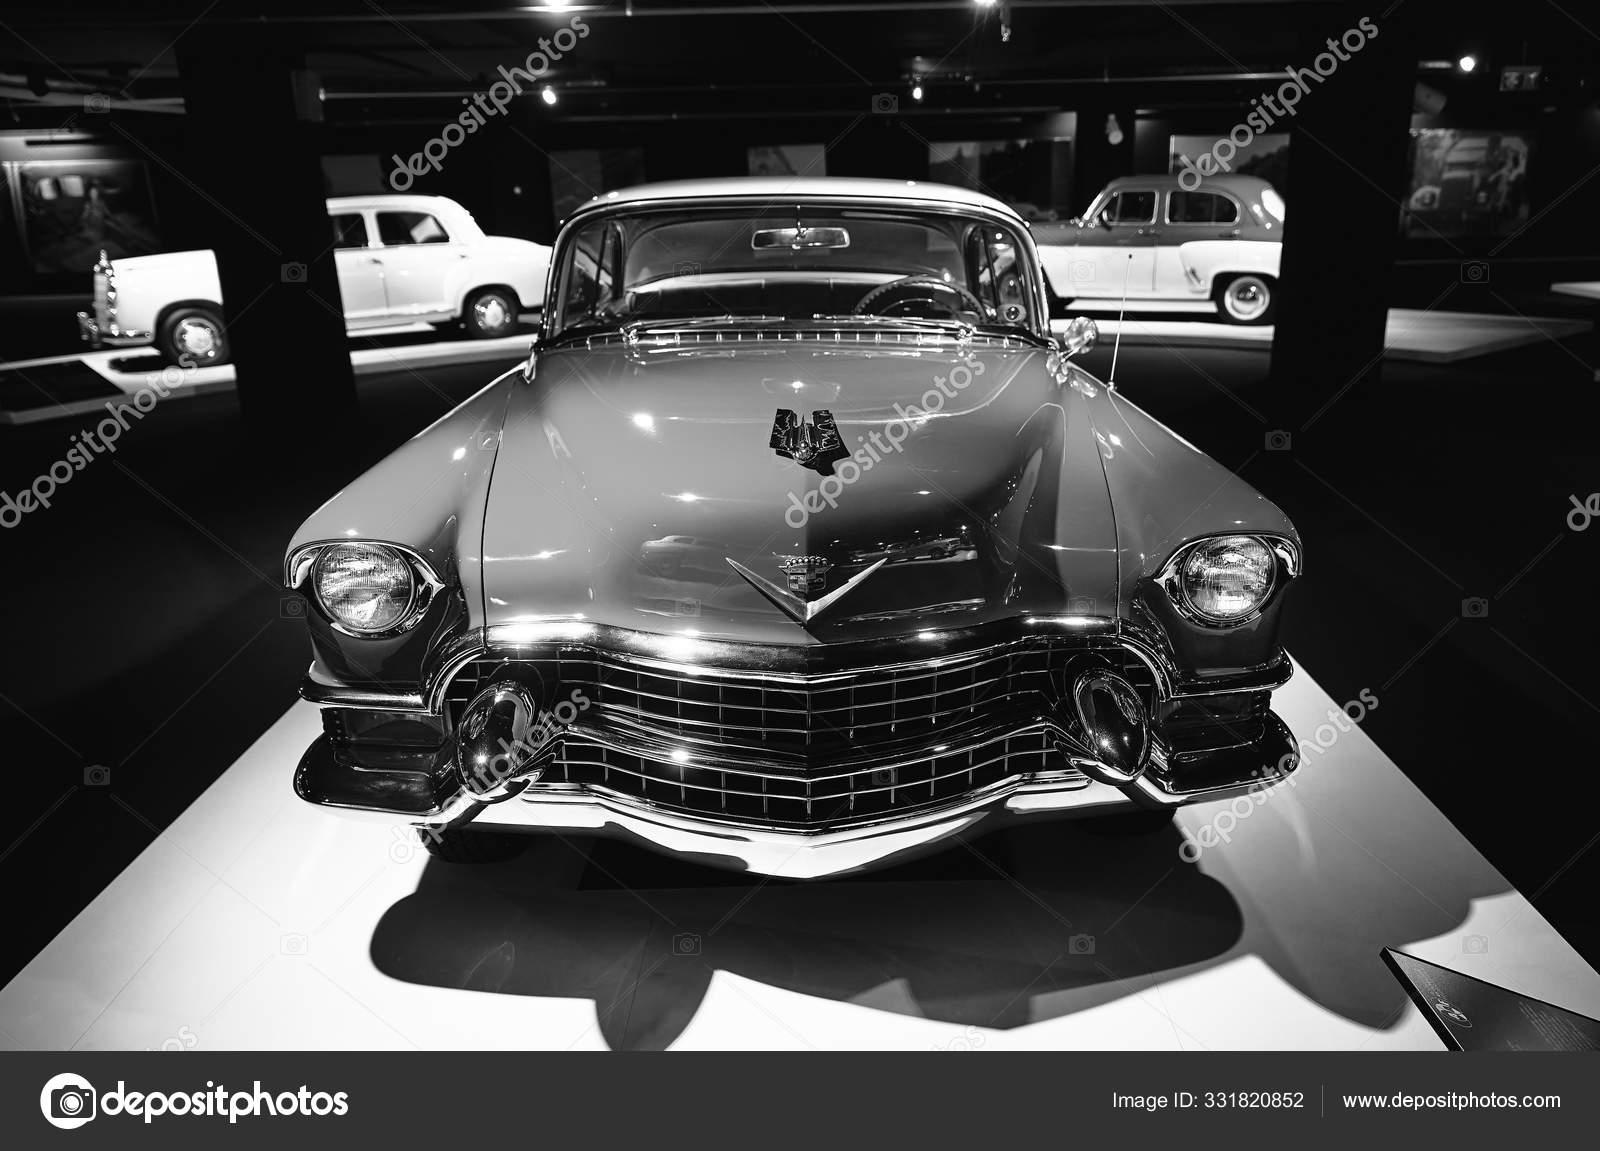 Cadillac Coupe Deville 1955 Retro Car On Exhibition Classic Stock Editorial Photo C Baranov Evgenii 331820852